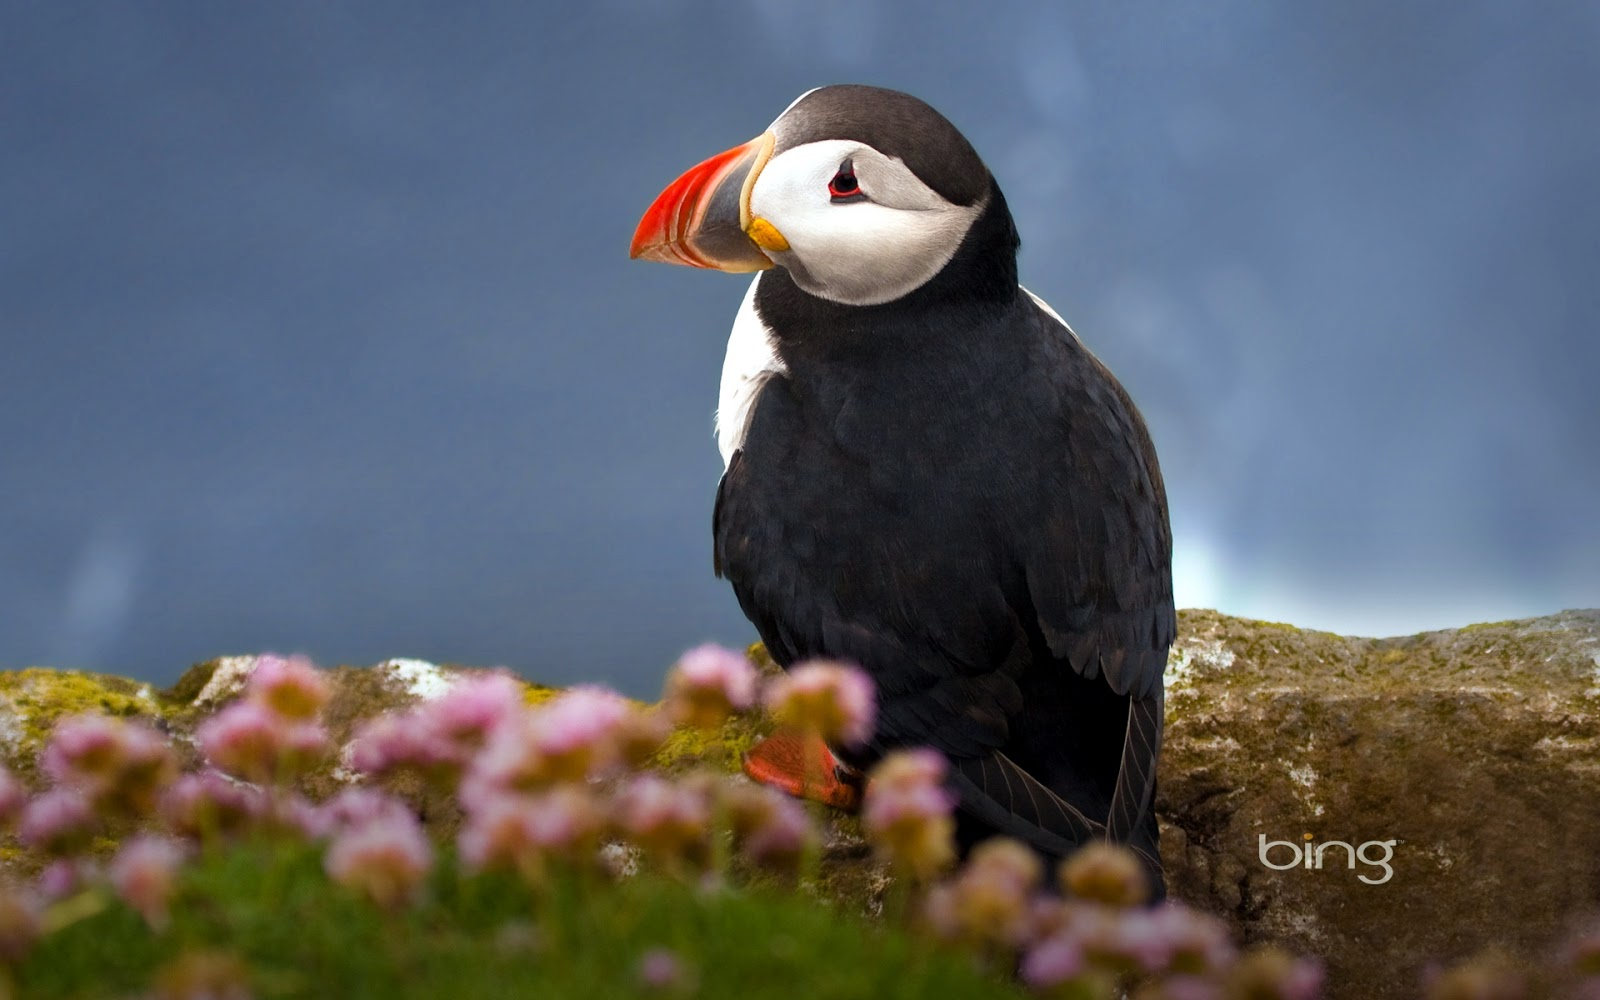 seabird atlantic puffin wallpapers - Seabird Atlantic Puffin Wallpapers HD Wallpapers